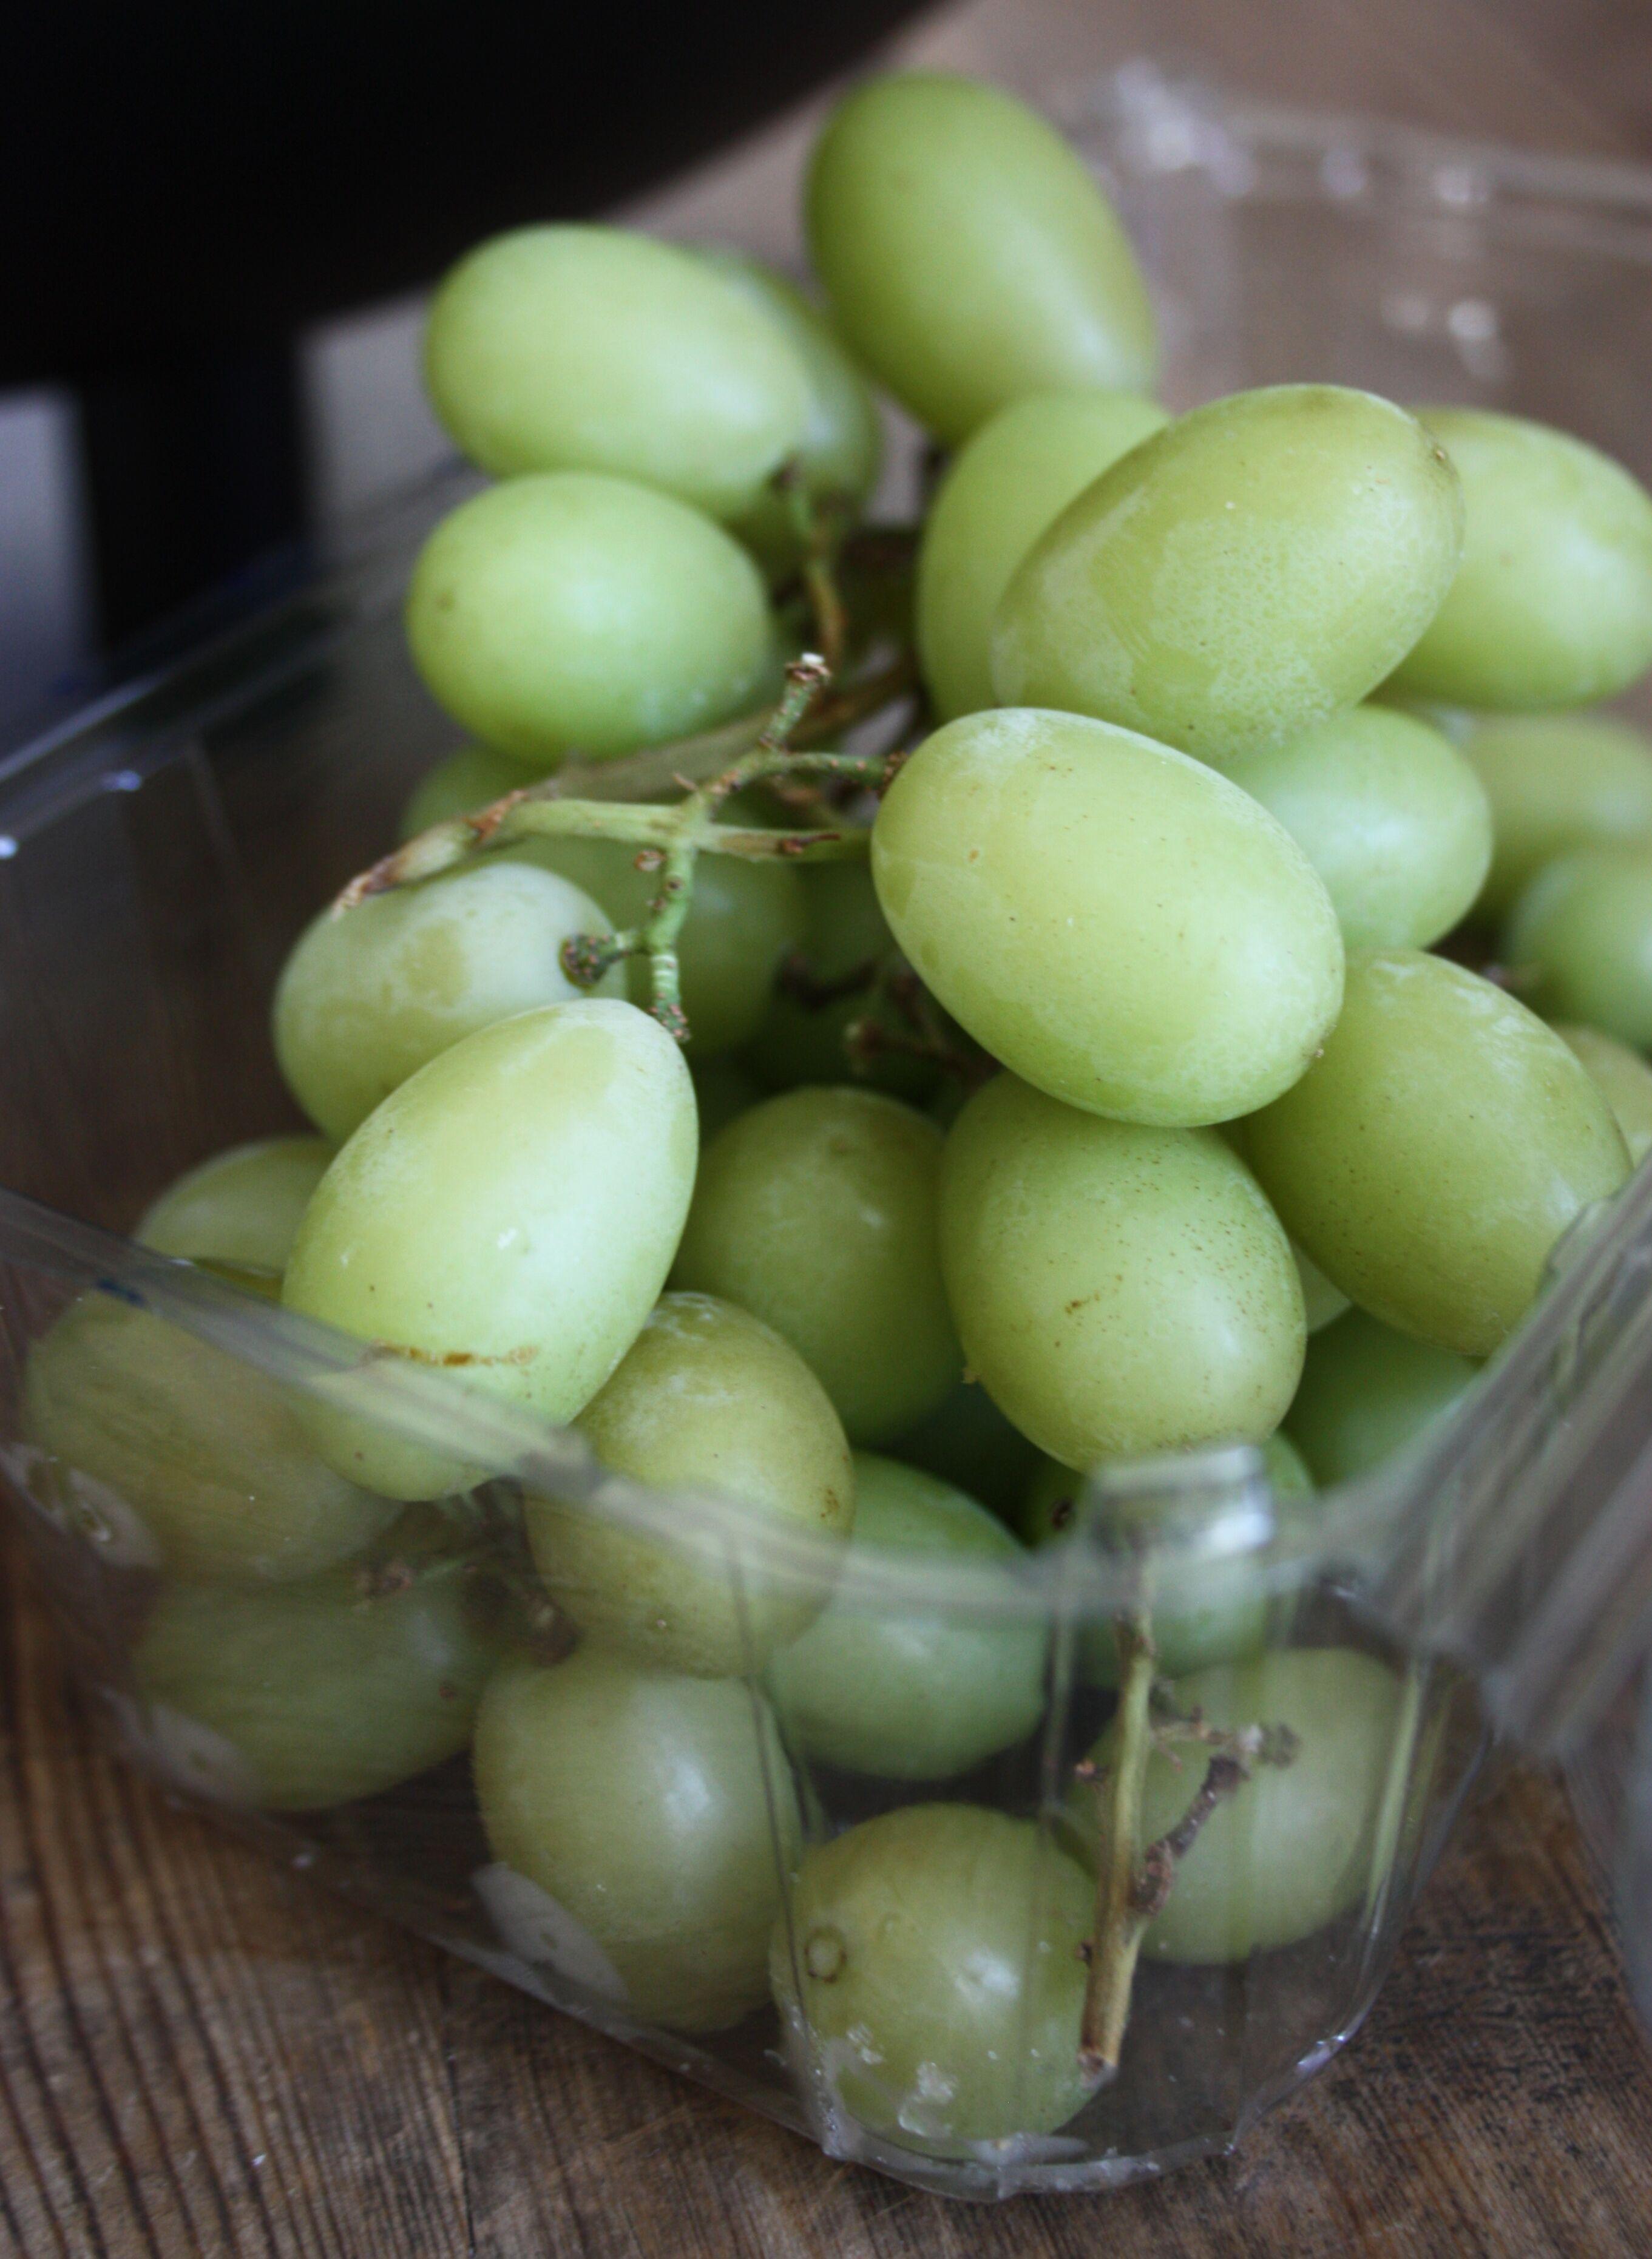 frysa vindruvor